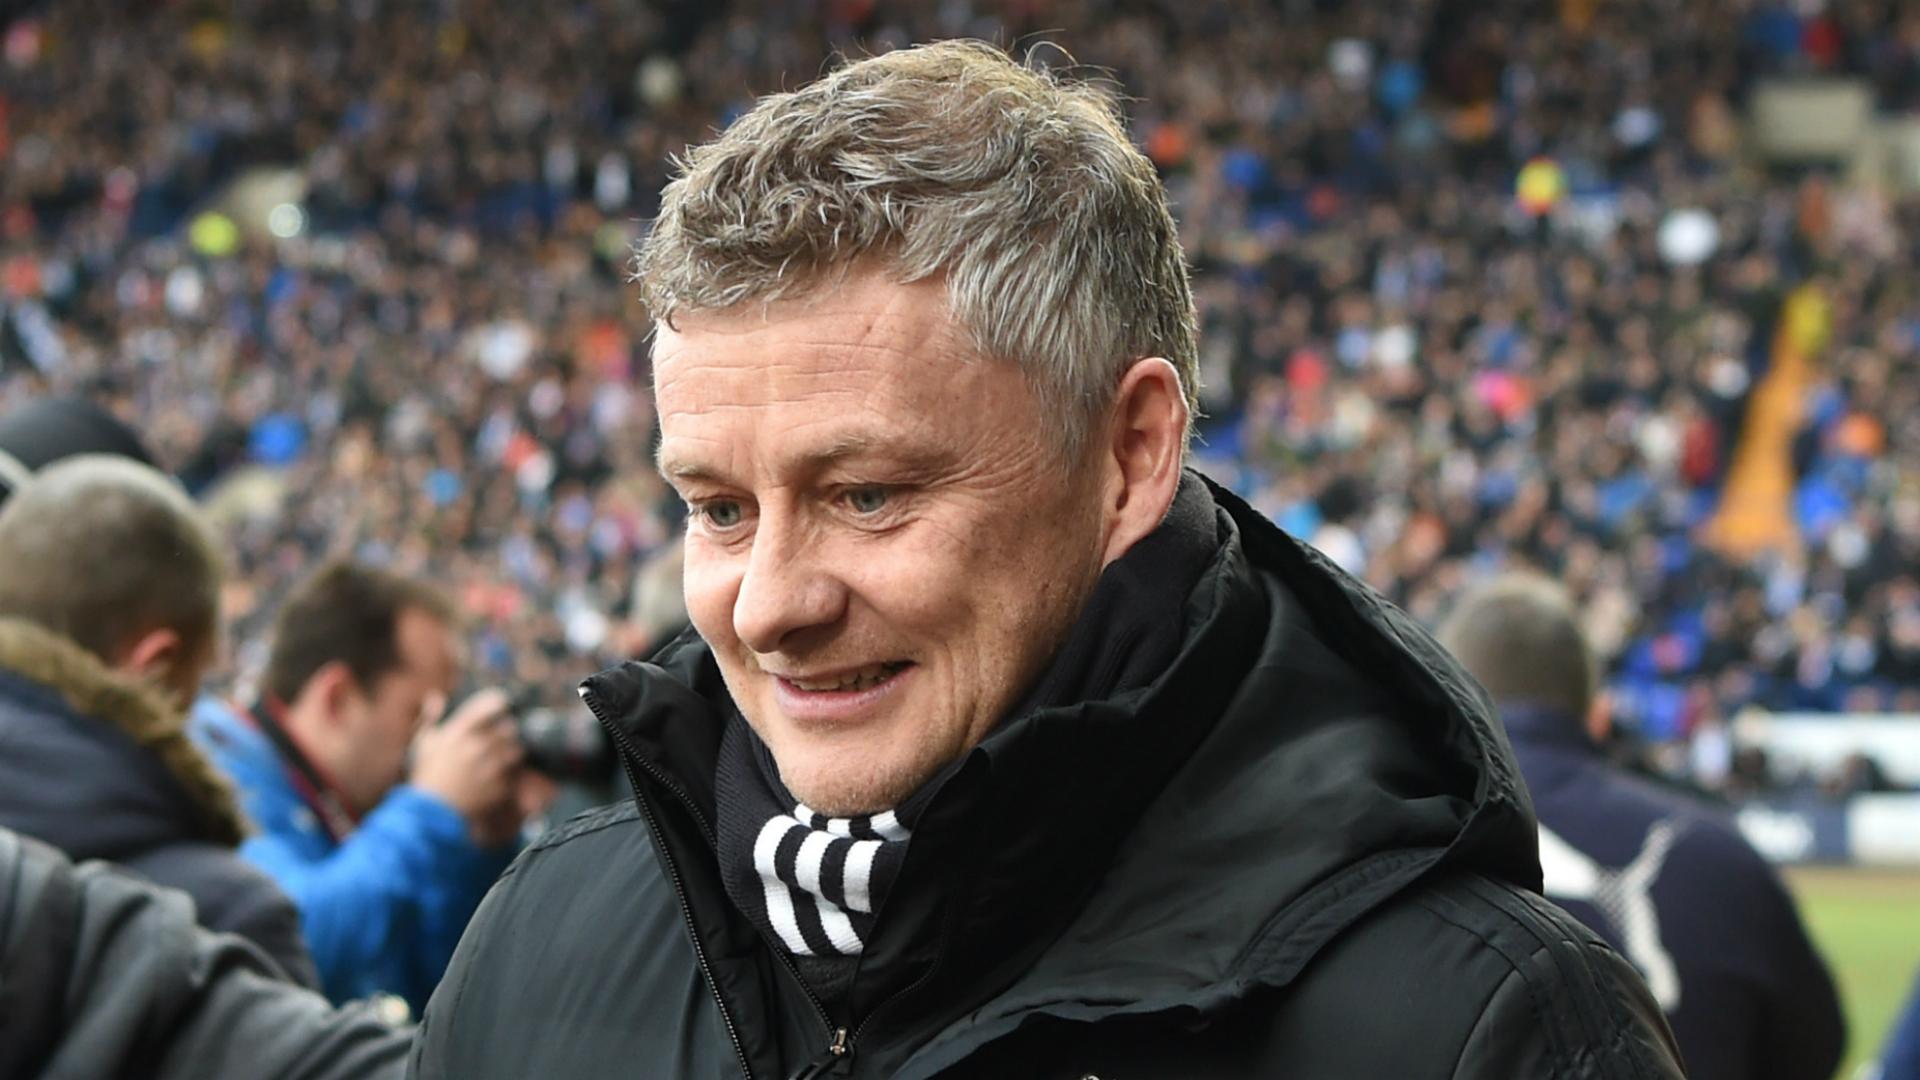 Solskjaer calls for unity after Man Utd easily avoid FA Cup upset